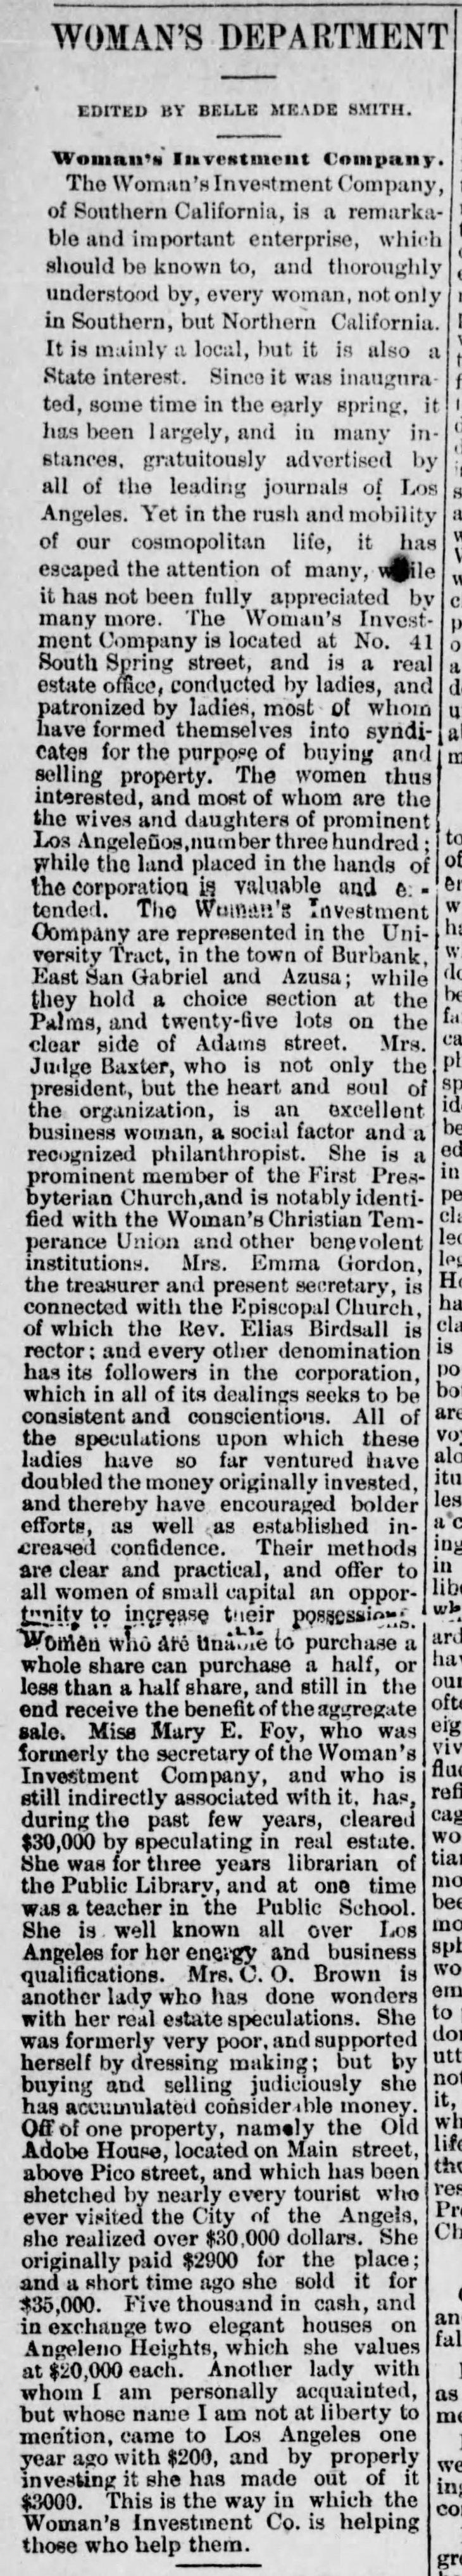 Los_Angeles_Herald_Sun__Oct_30__1887_